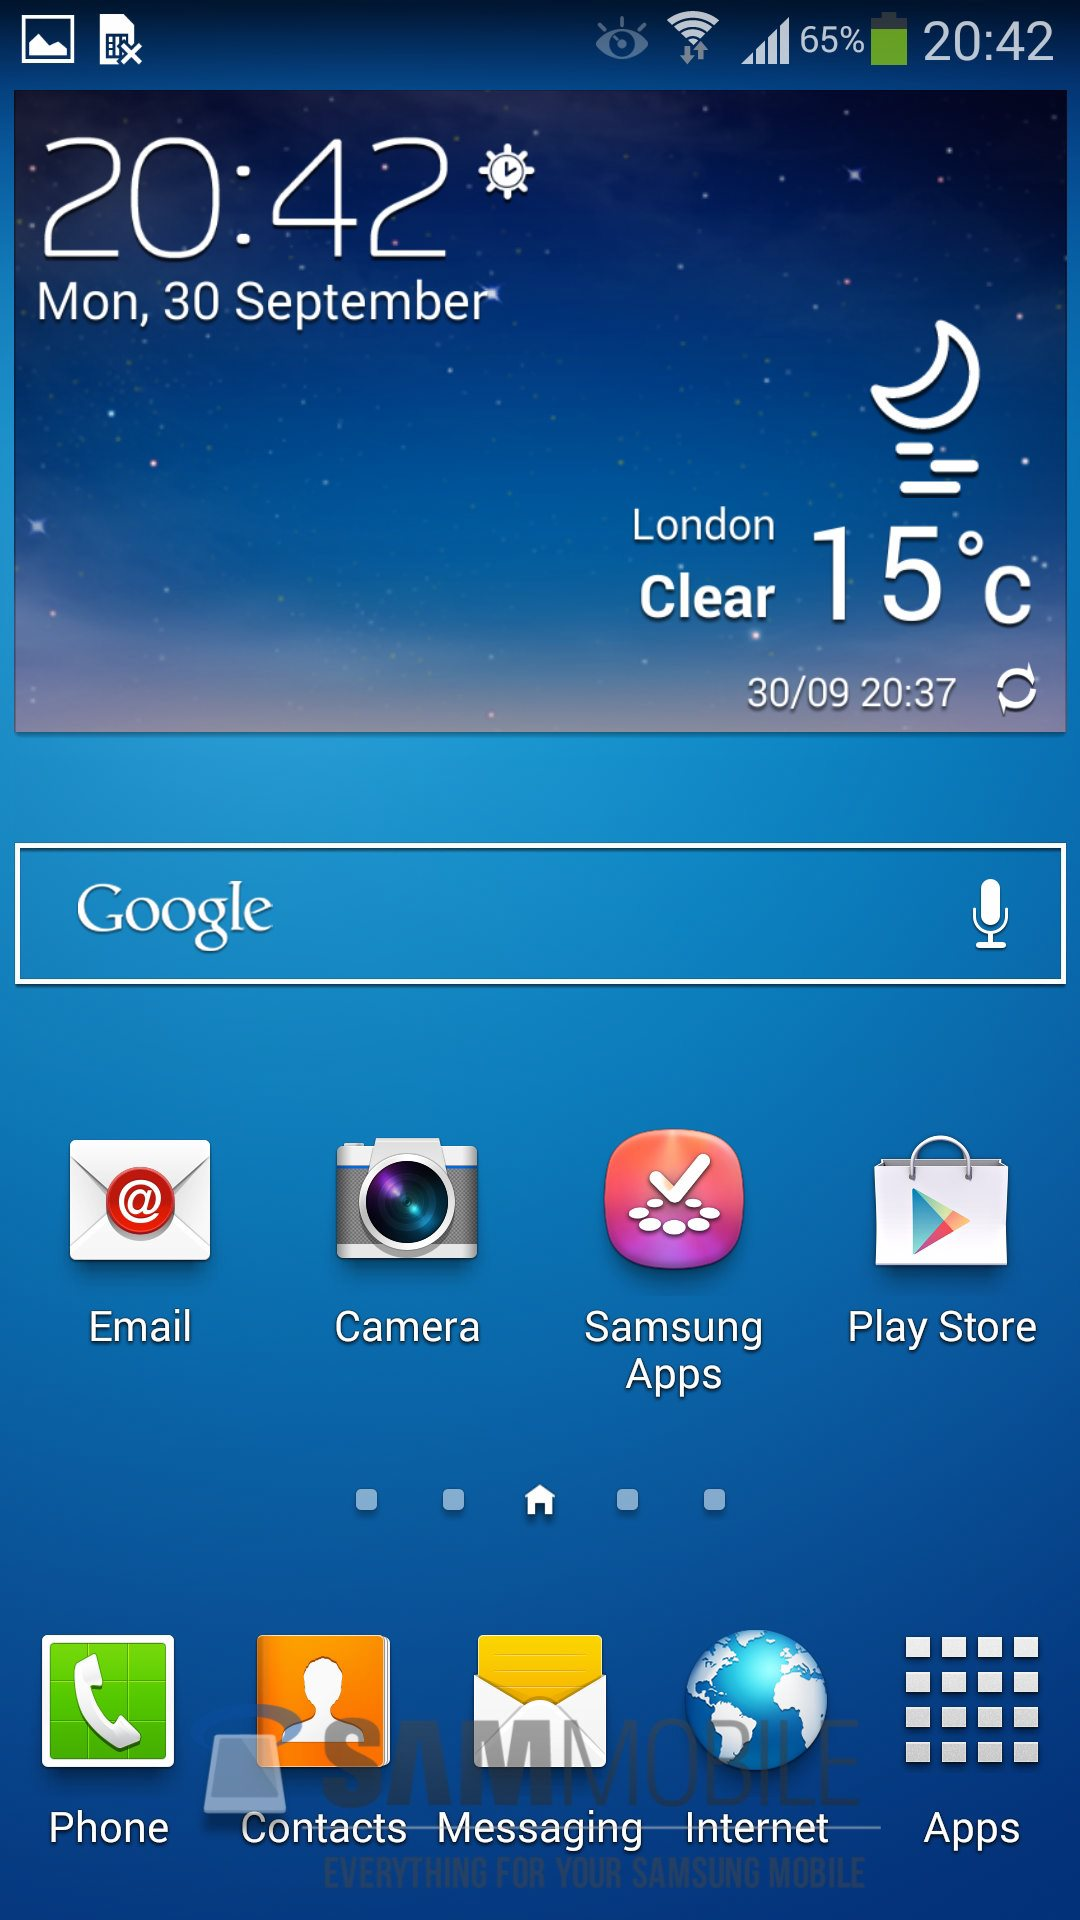 Android4.3_Samsung_Galaxy_S4_XXUEMI8 (3)